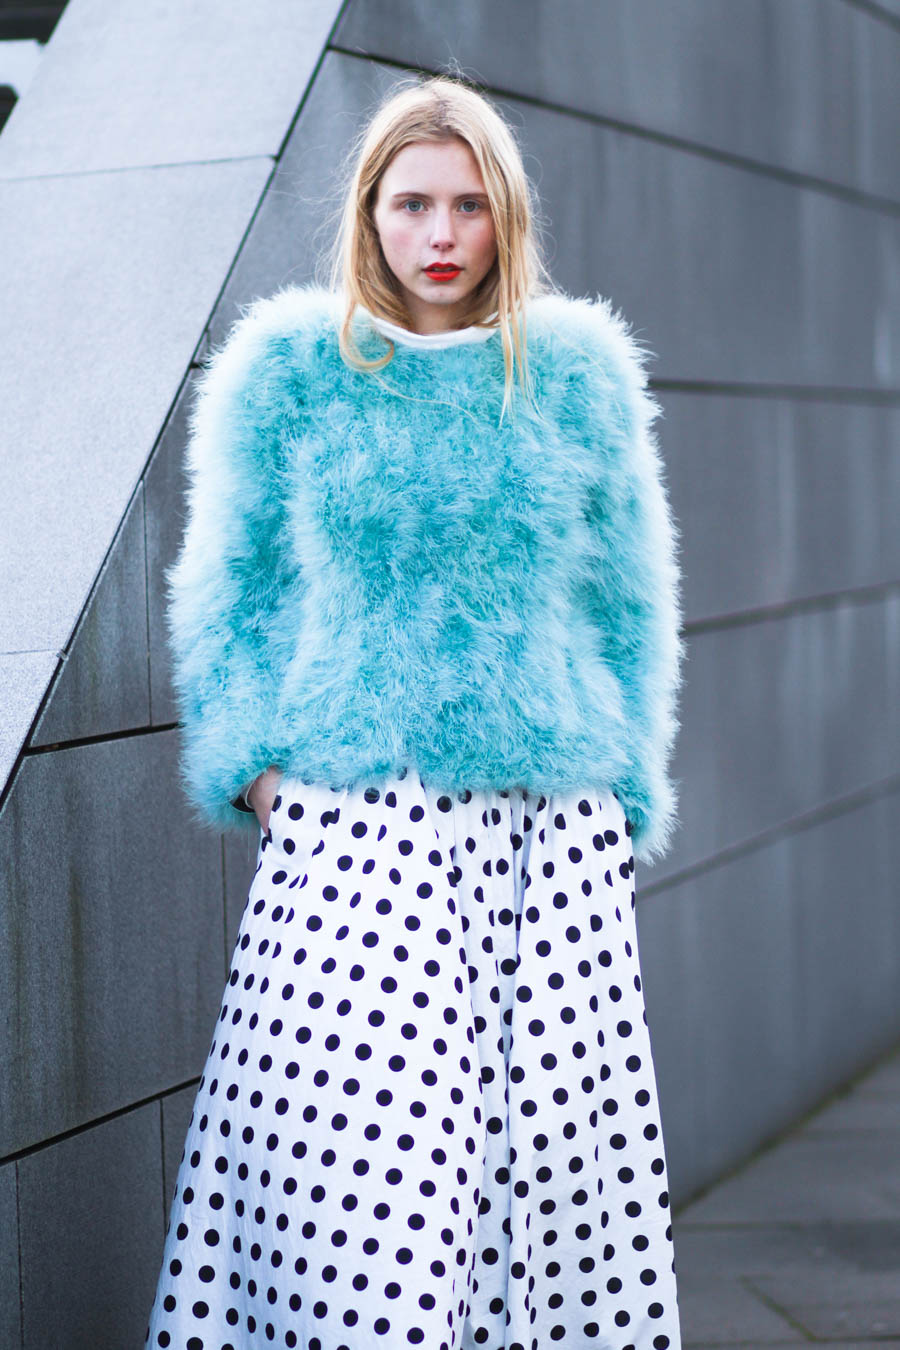 outfit December nemesis babe marie jensen danish blogger -3-6